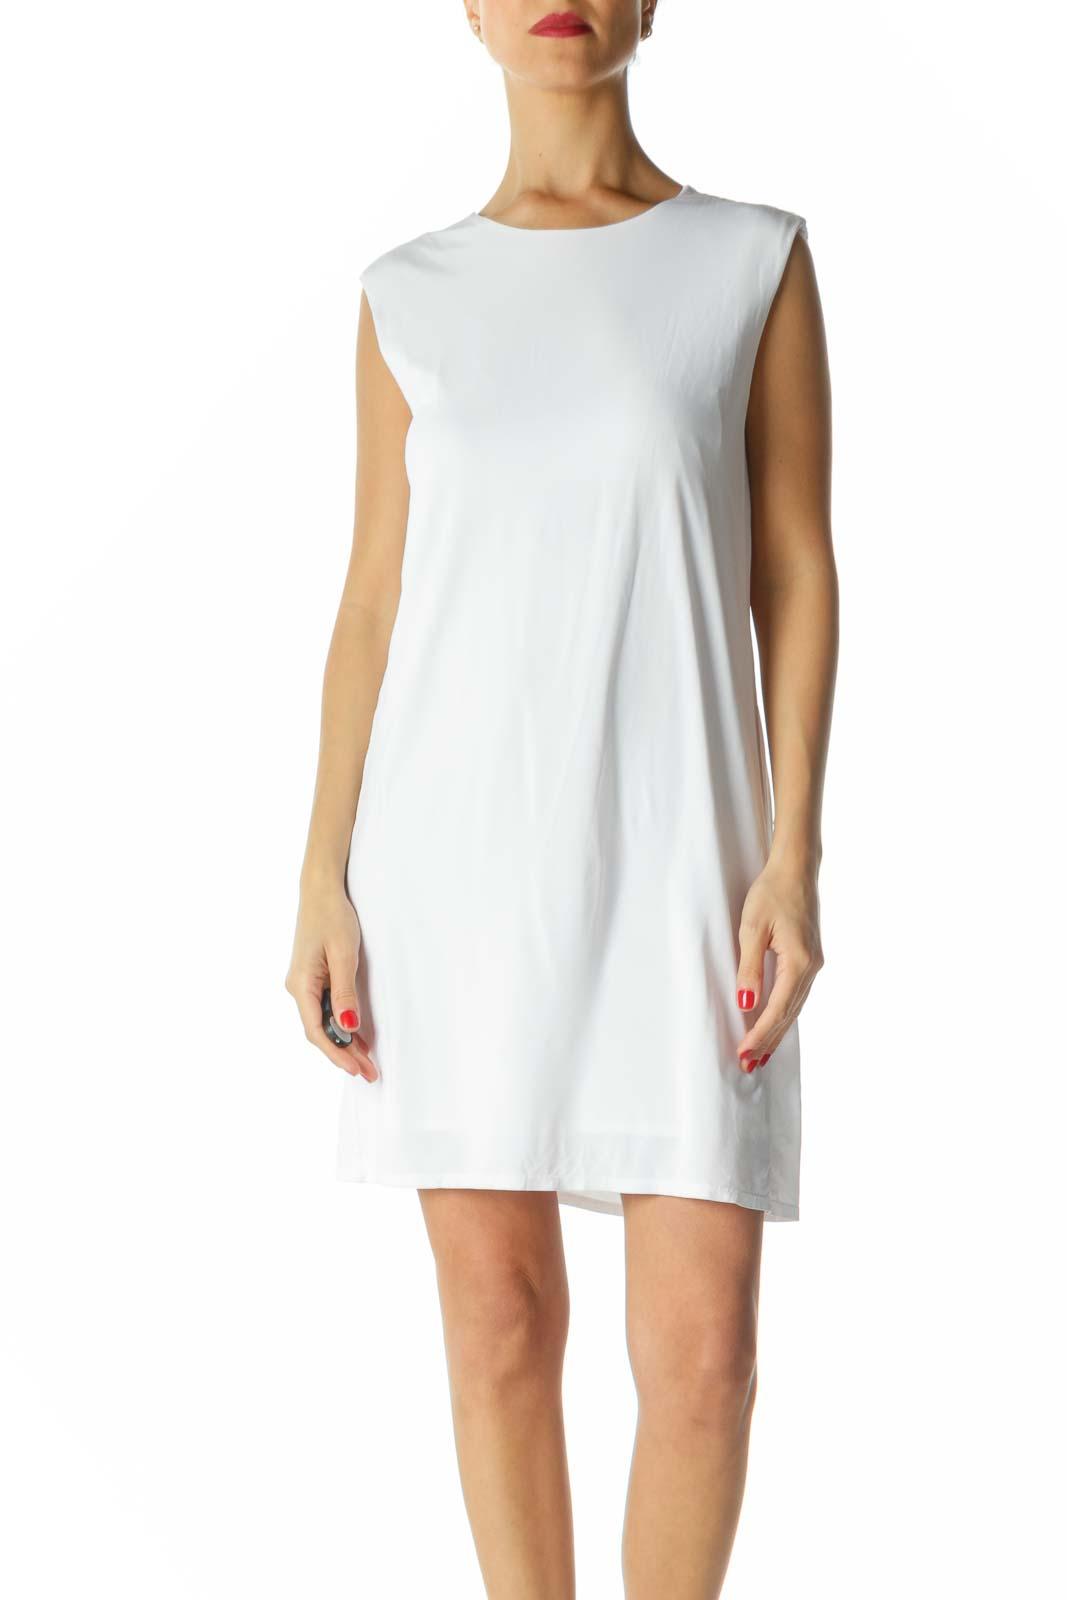 White Sleeveless Shift Dress Front